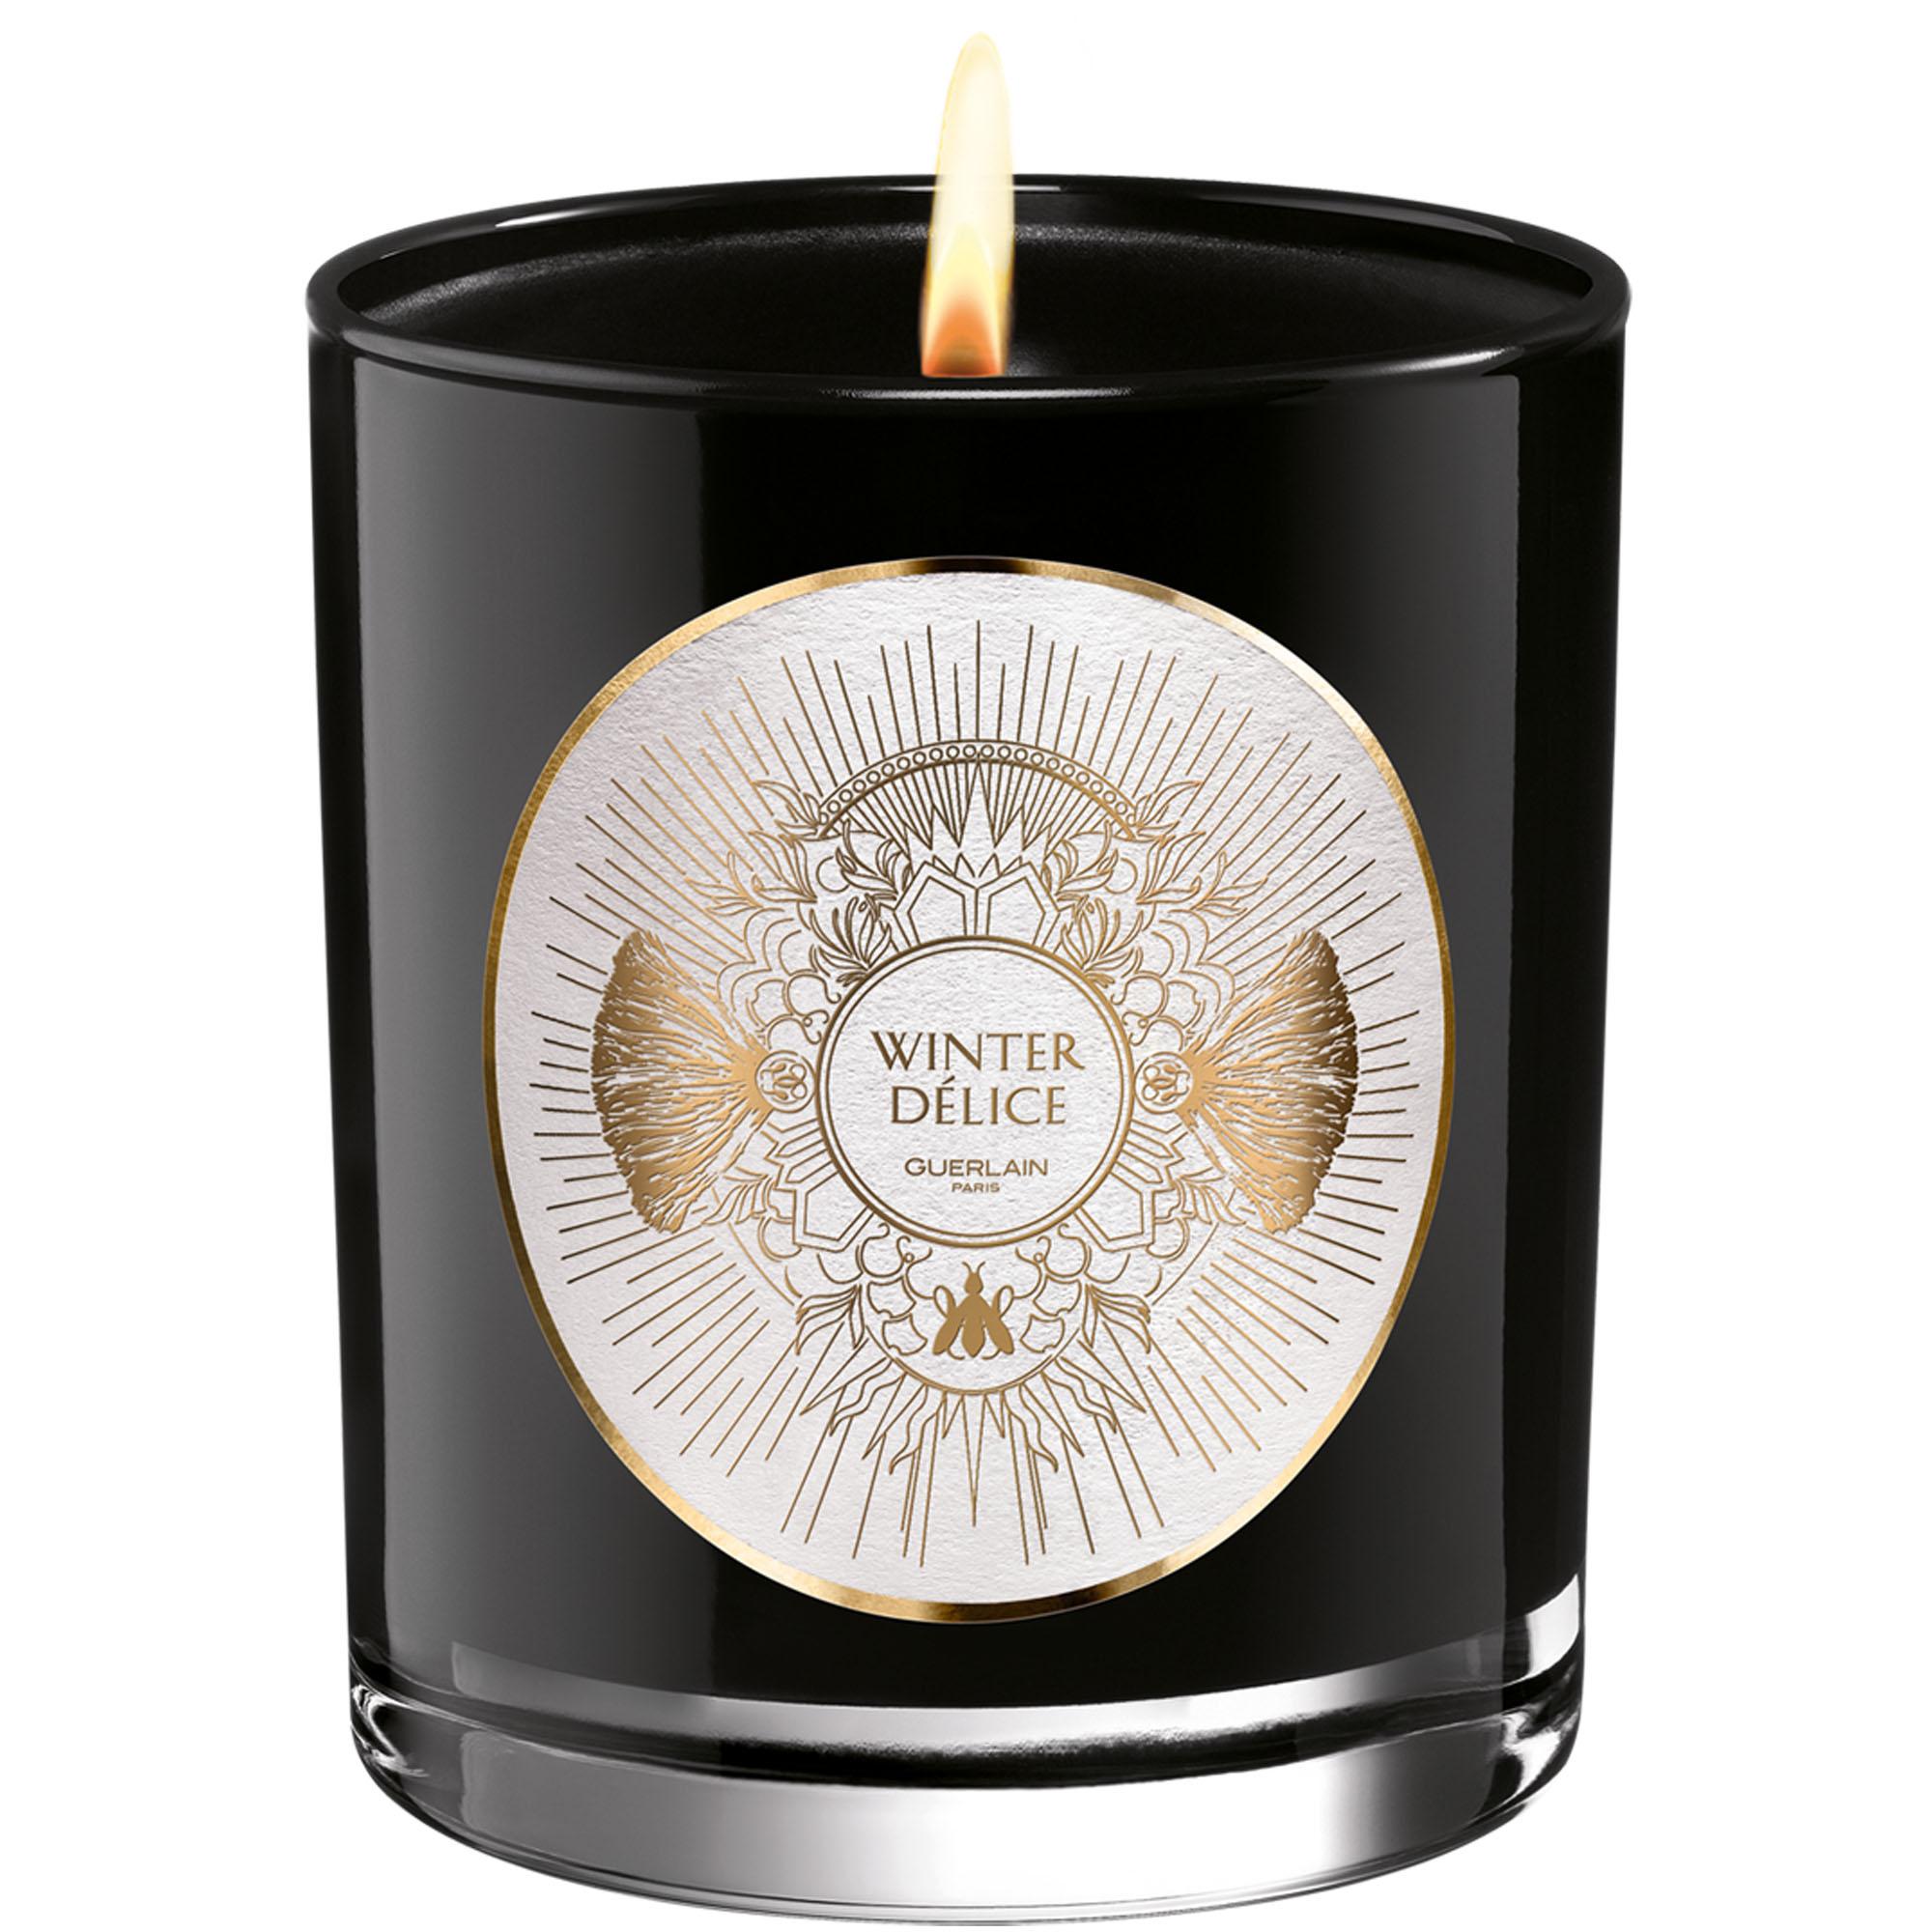 Guerlain-Winter-Delise-Candle.jpg